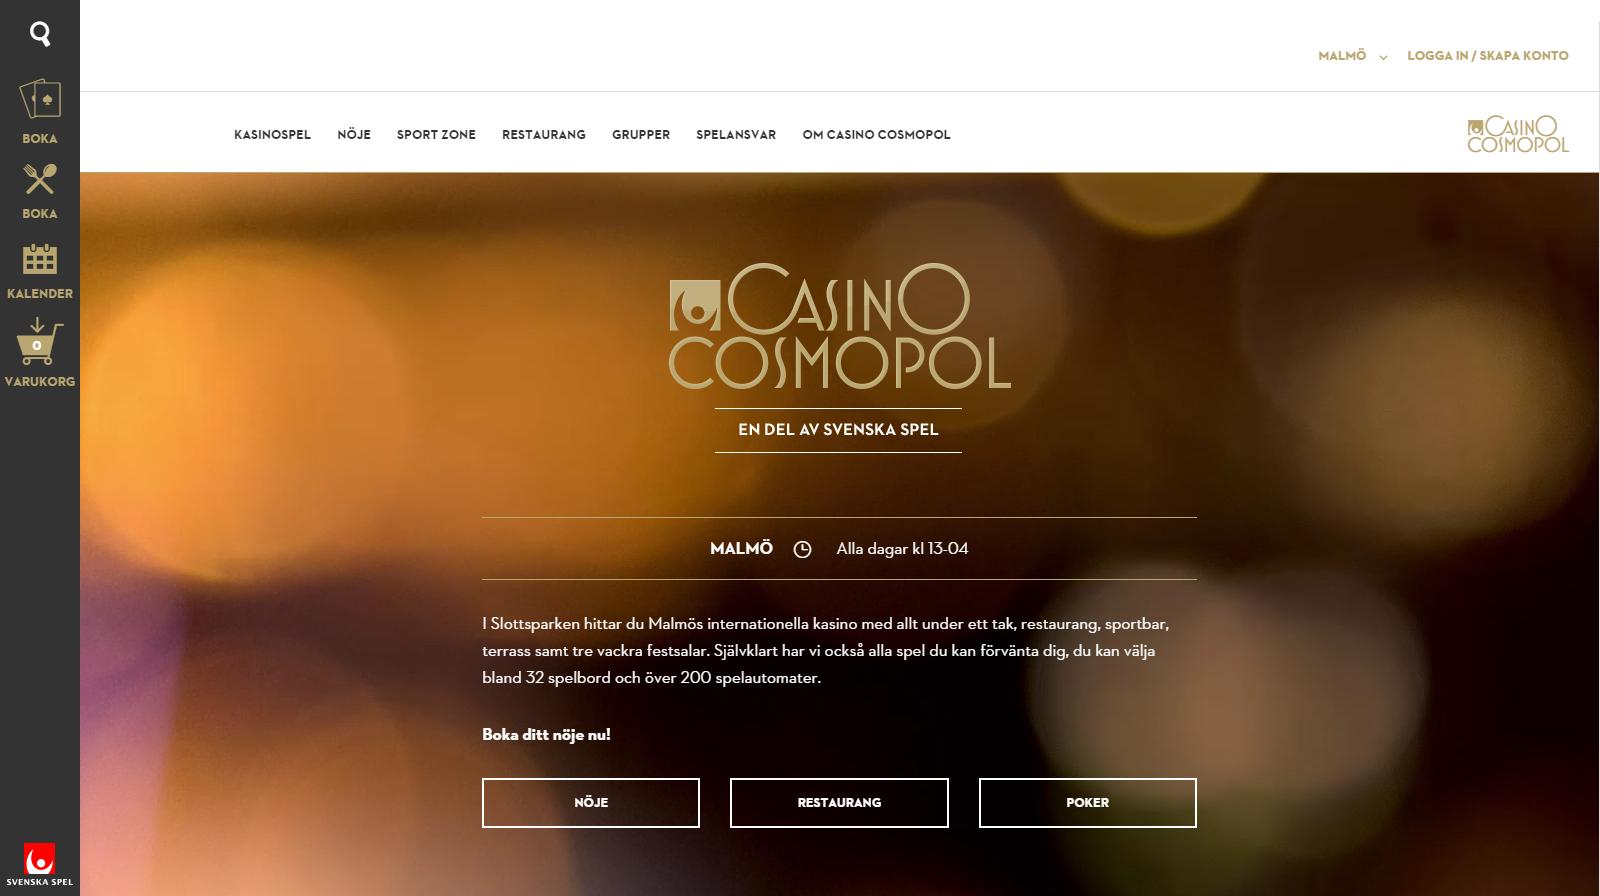 casino cosmopol nya sidan